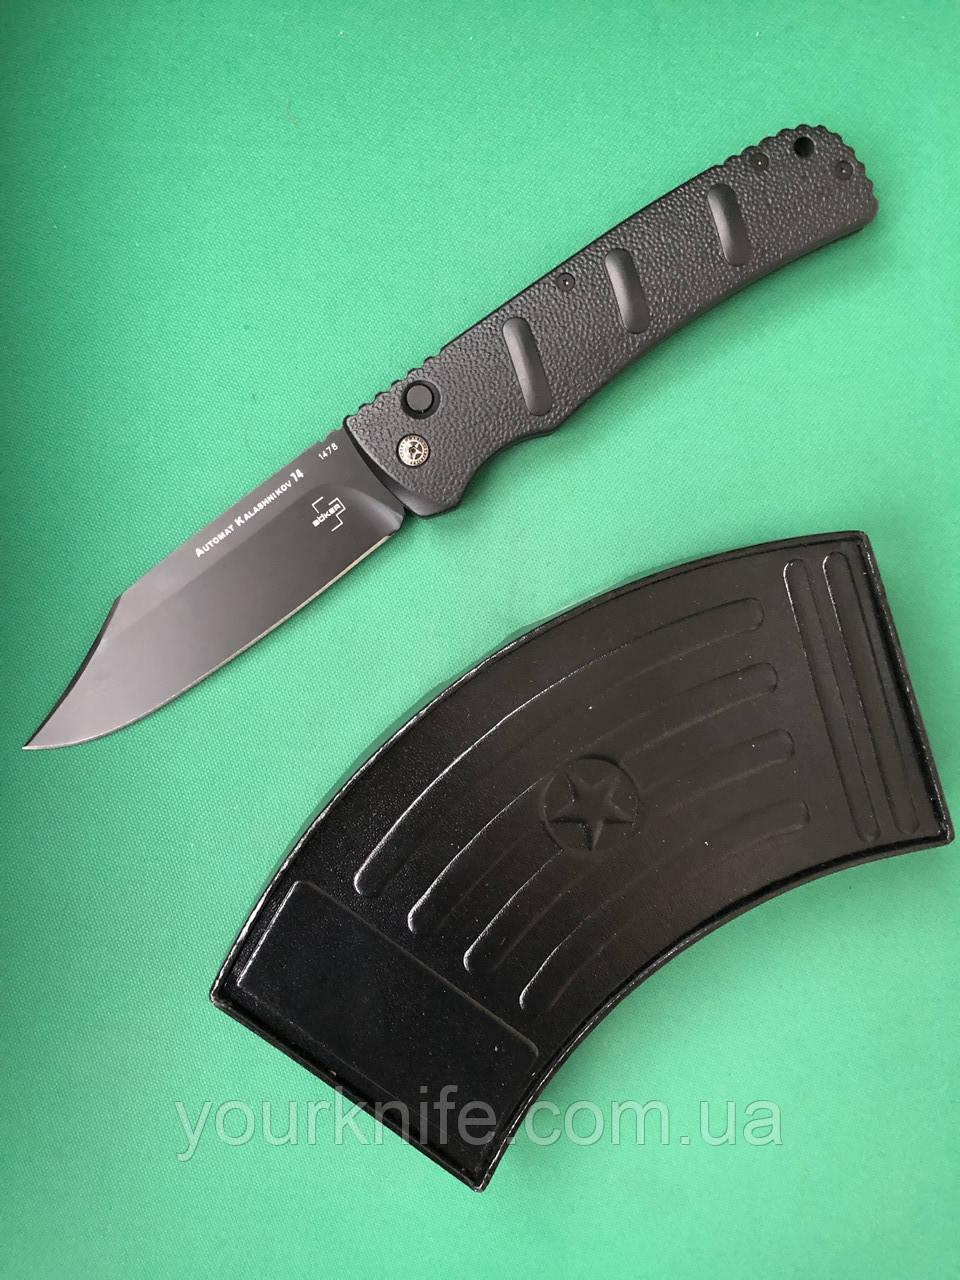 Купить нож Boker Kalashnikov XXL Auto Bowie D2 Black